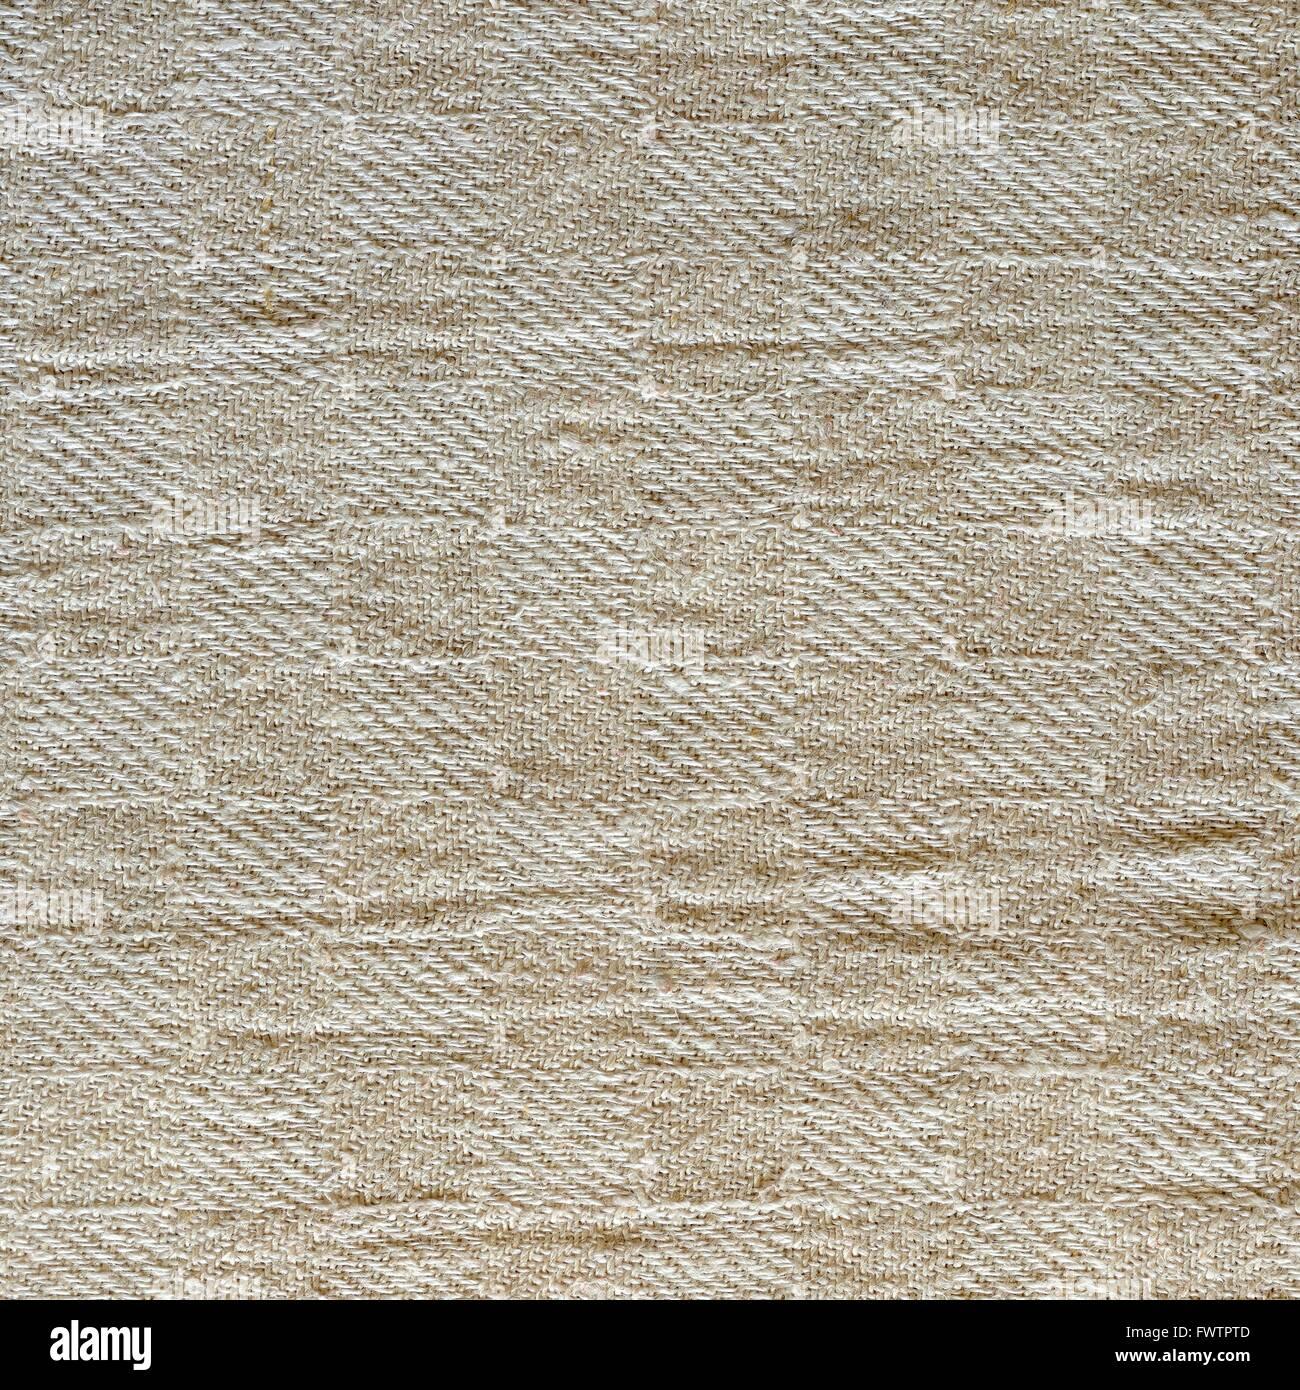 Linen tablecloth texture wallpaper - Stock Image